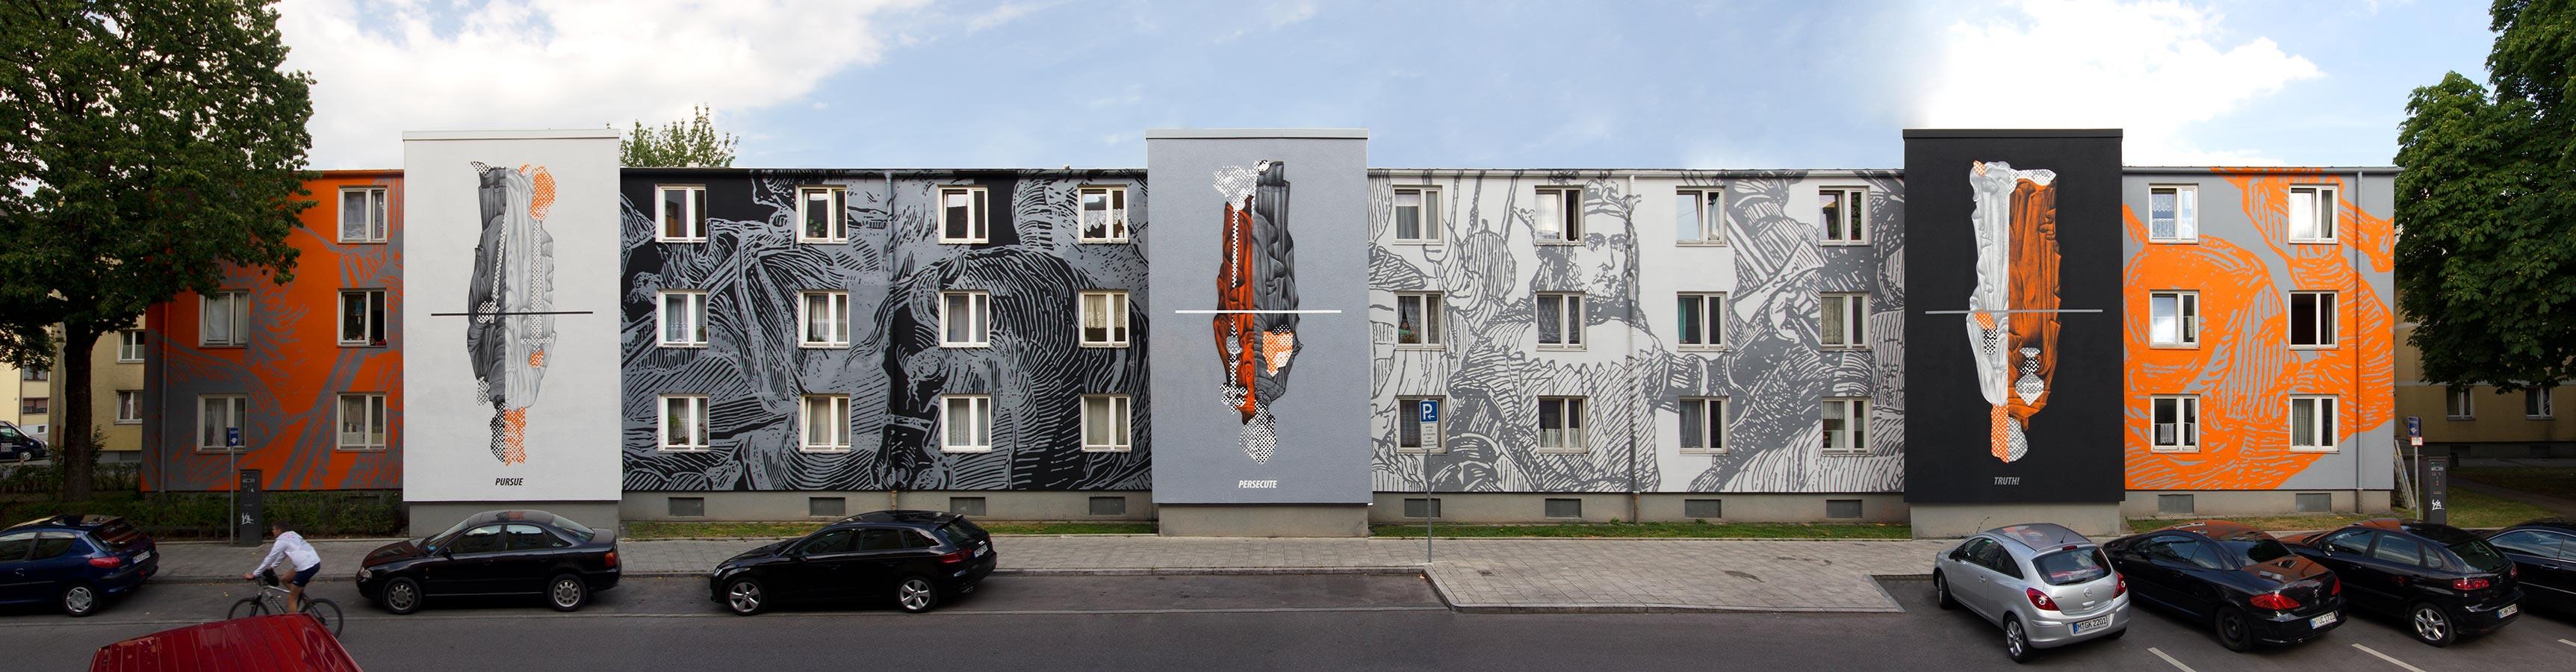 Streetart in München Westend